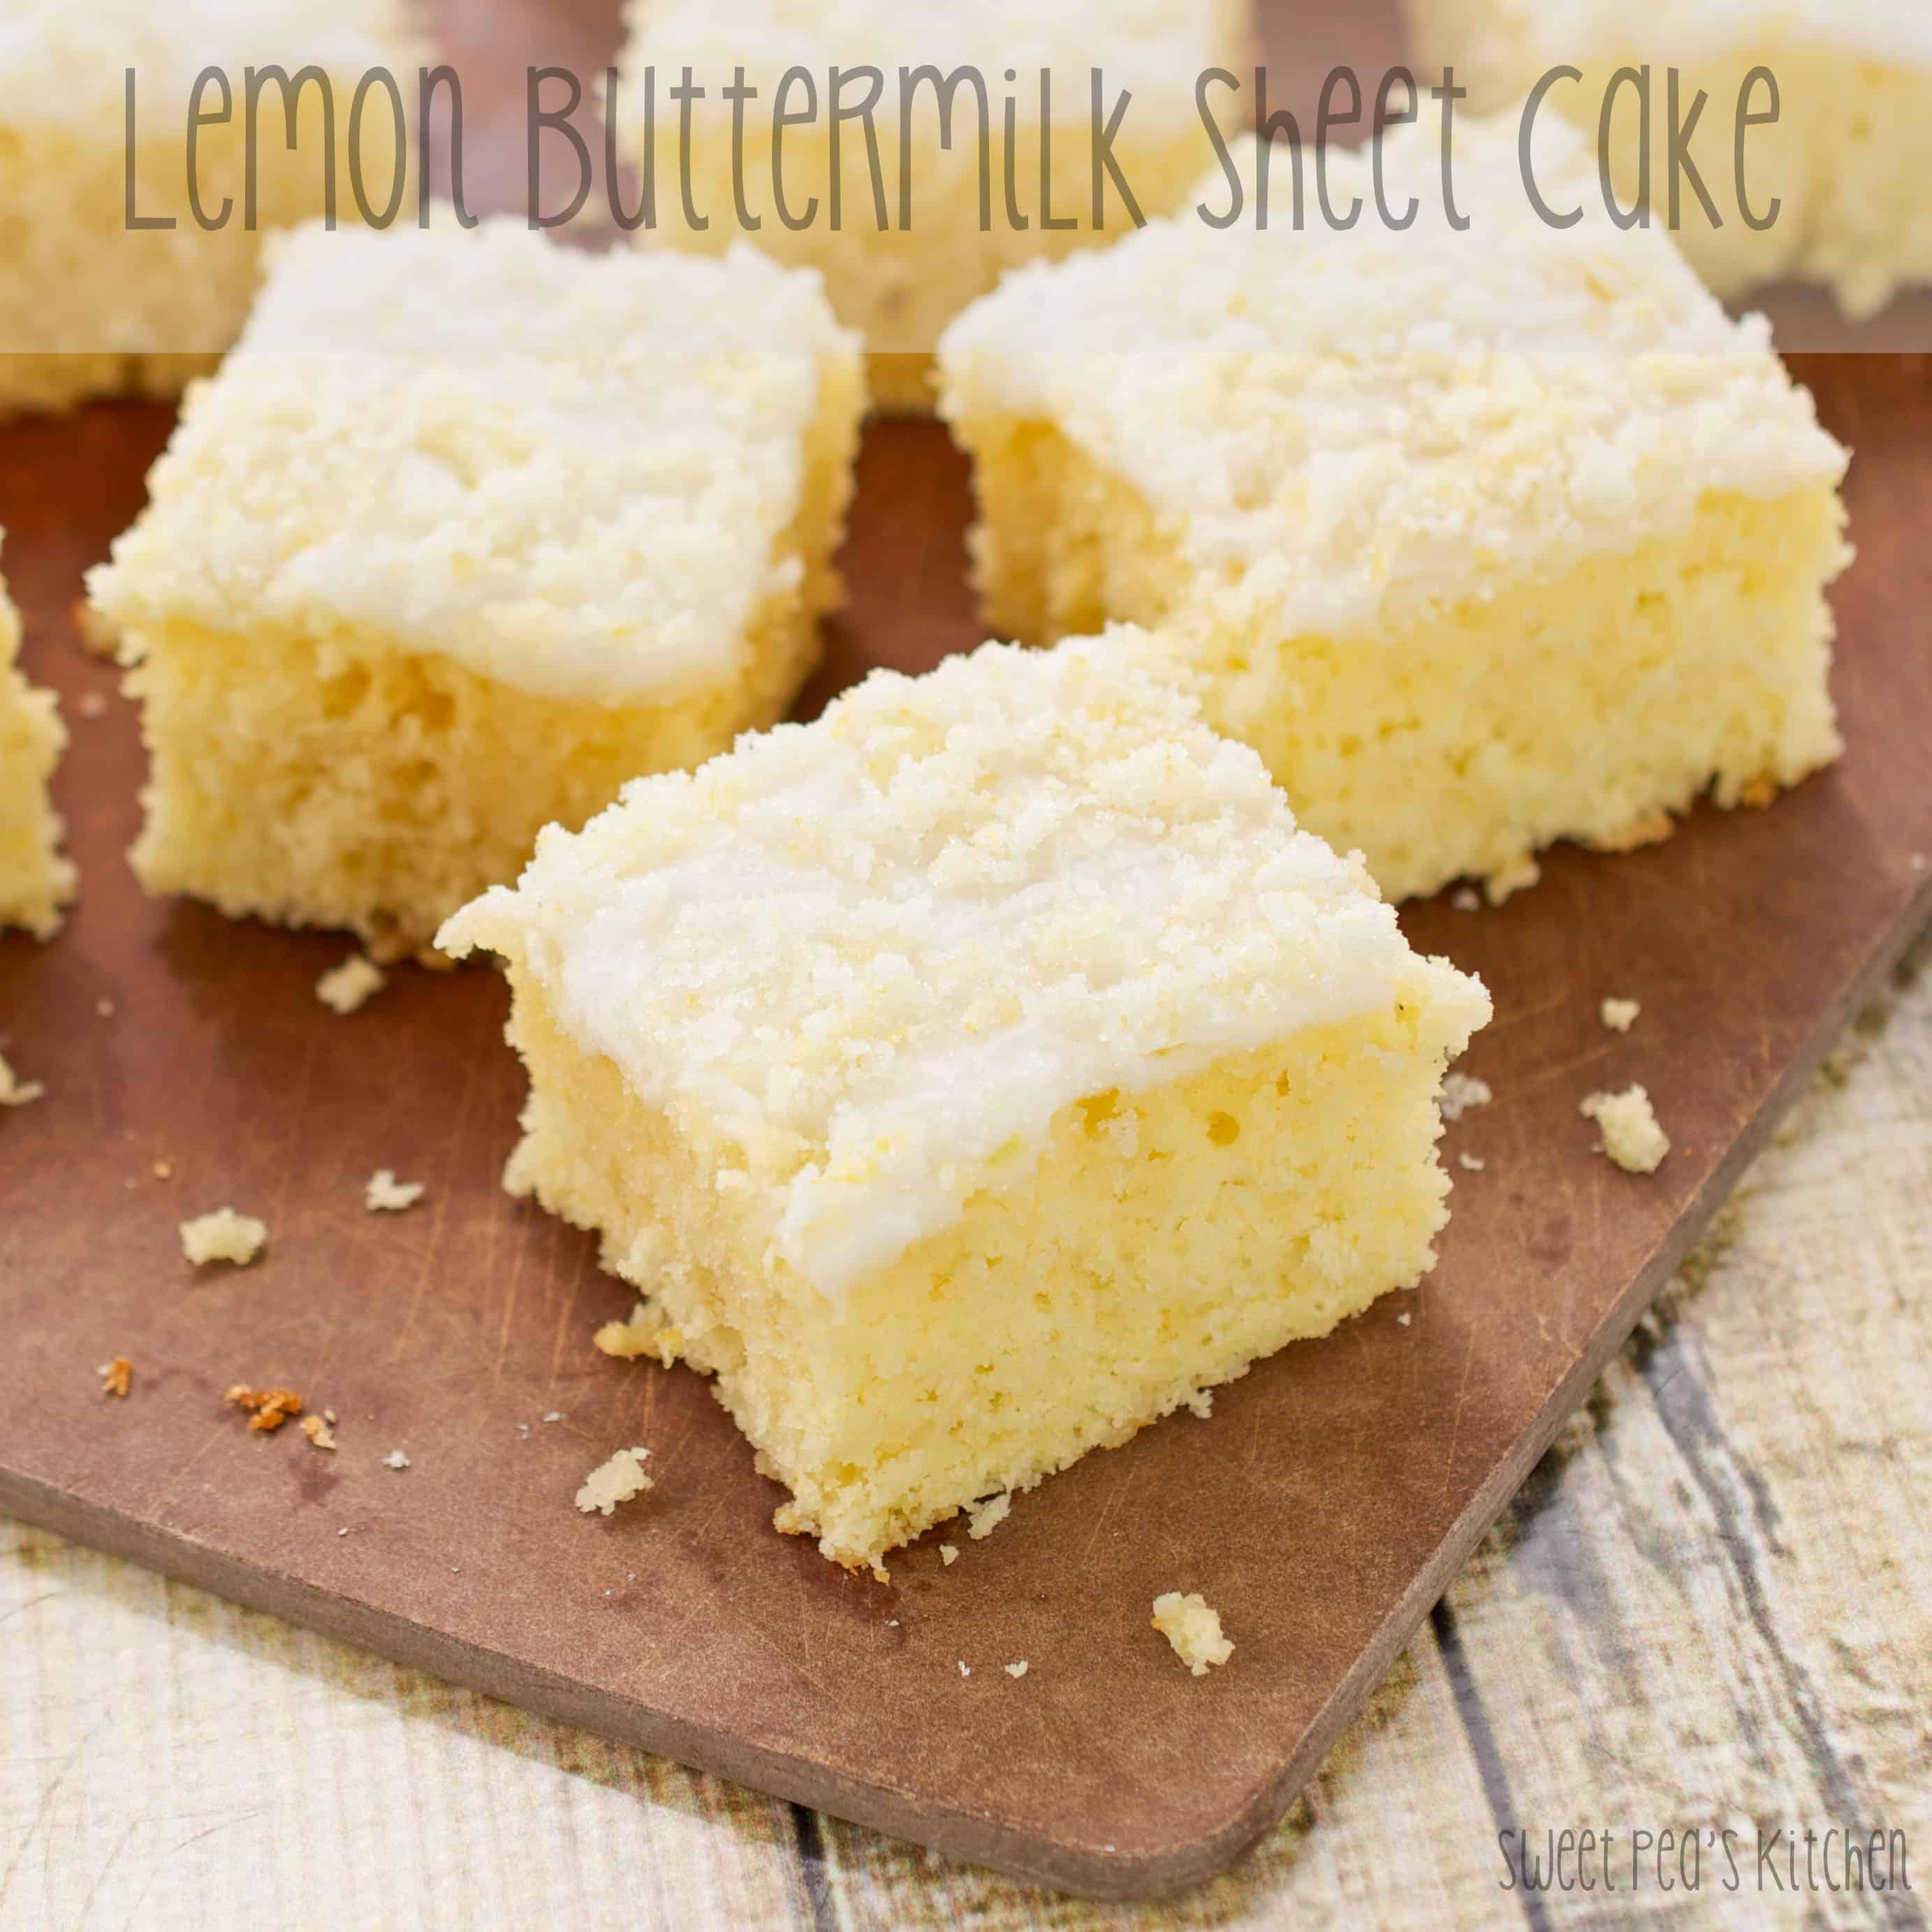 slices of moist lemon cake recipe on a wooden board